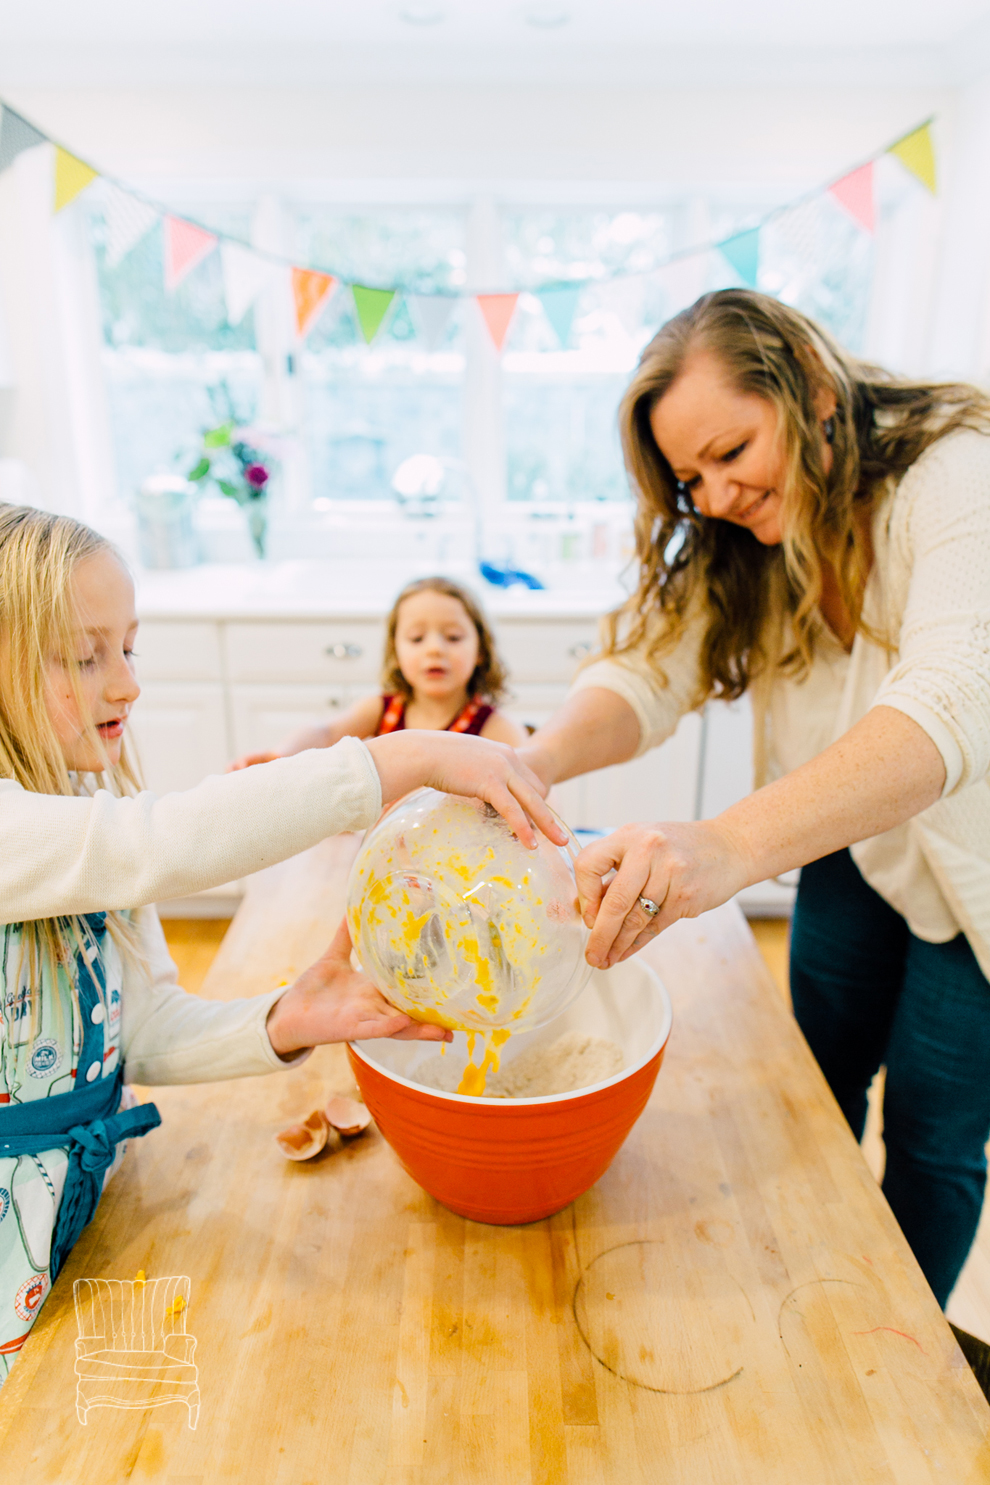 009-bellingham-family-lifestyle-photographer-katheryn-moran-kitchen-baking-pippin.jpg